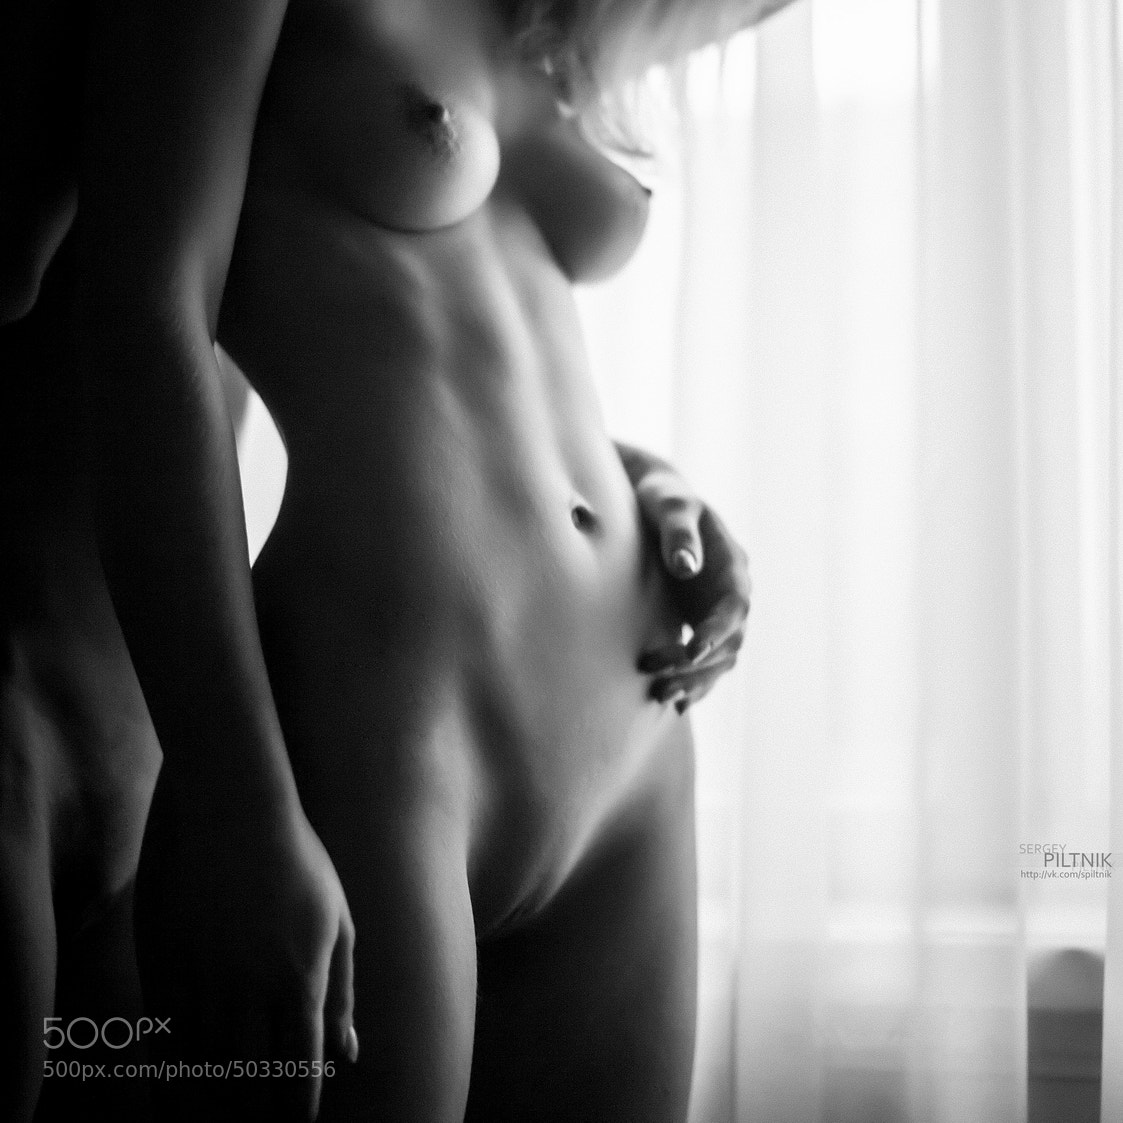 Photograph touches ...5 by Serg  Piltnik (Пилтник) on 500px